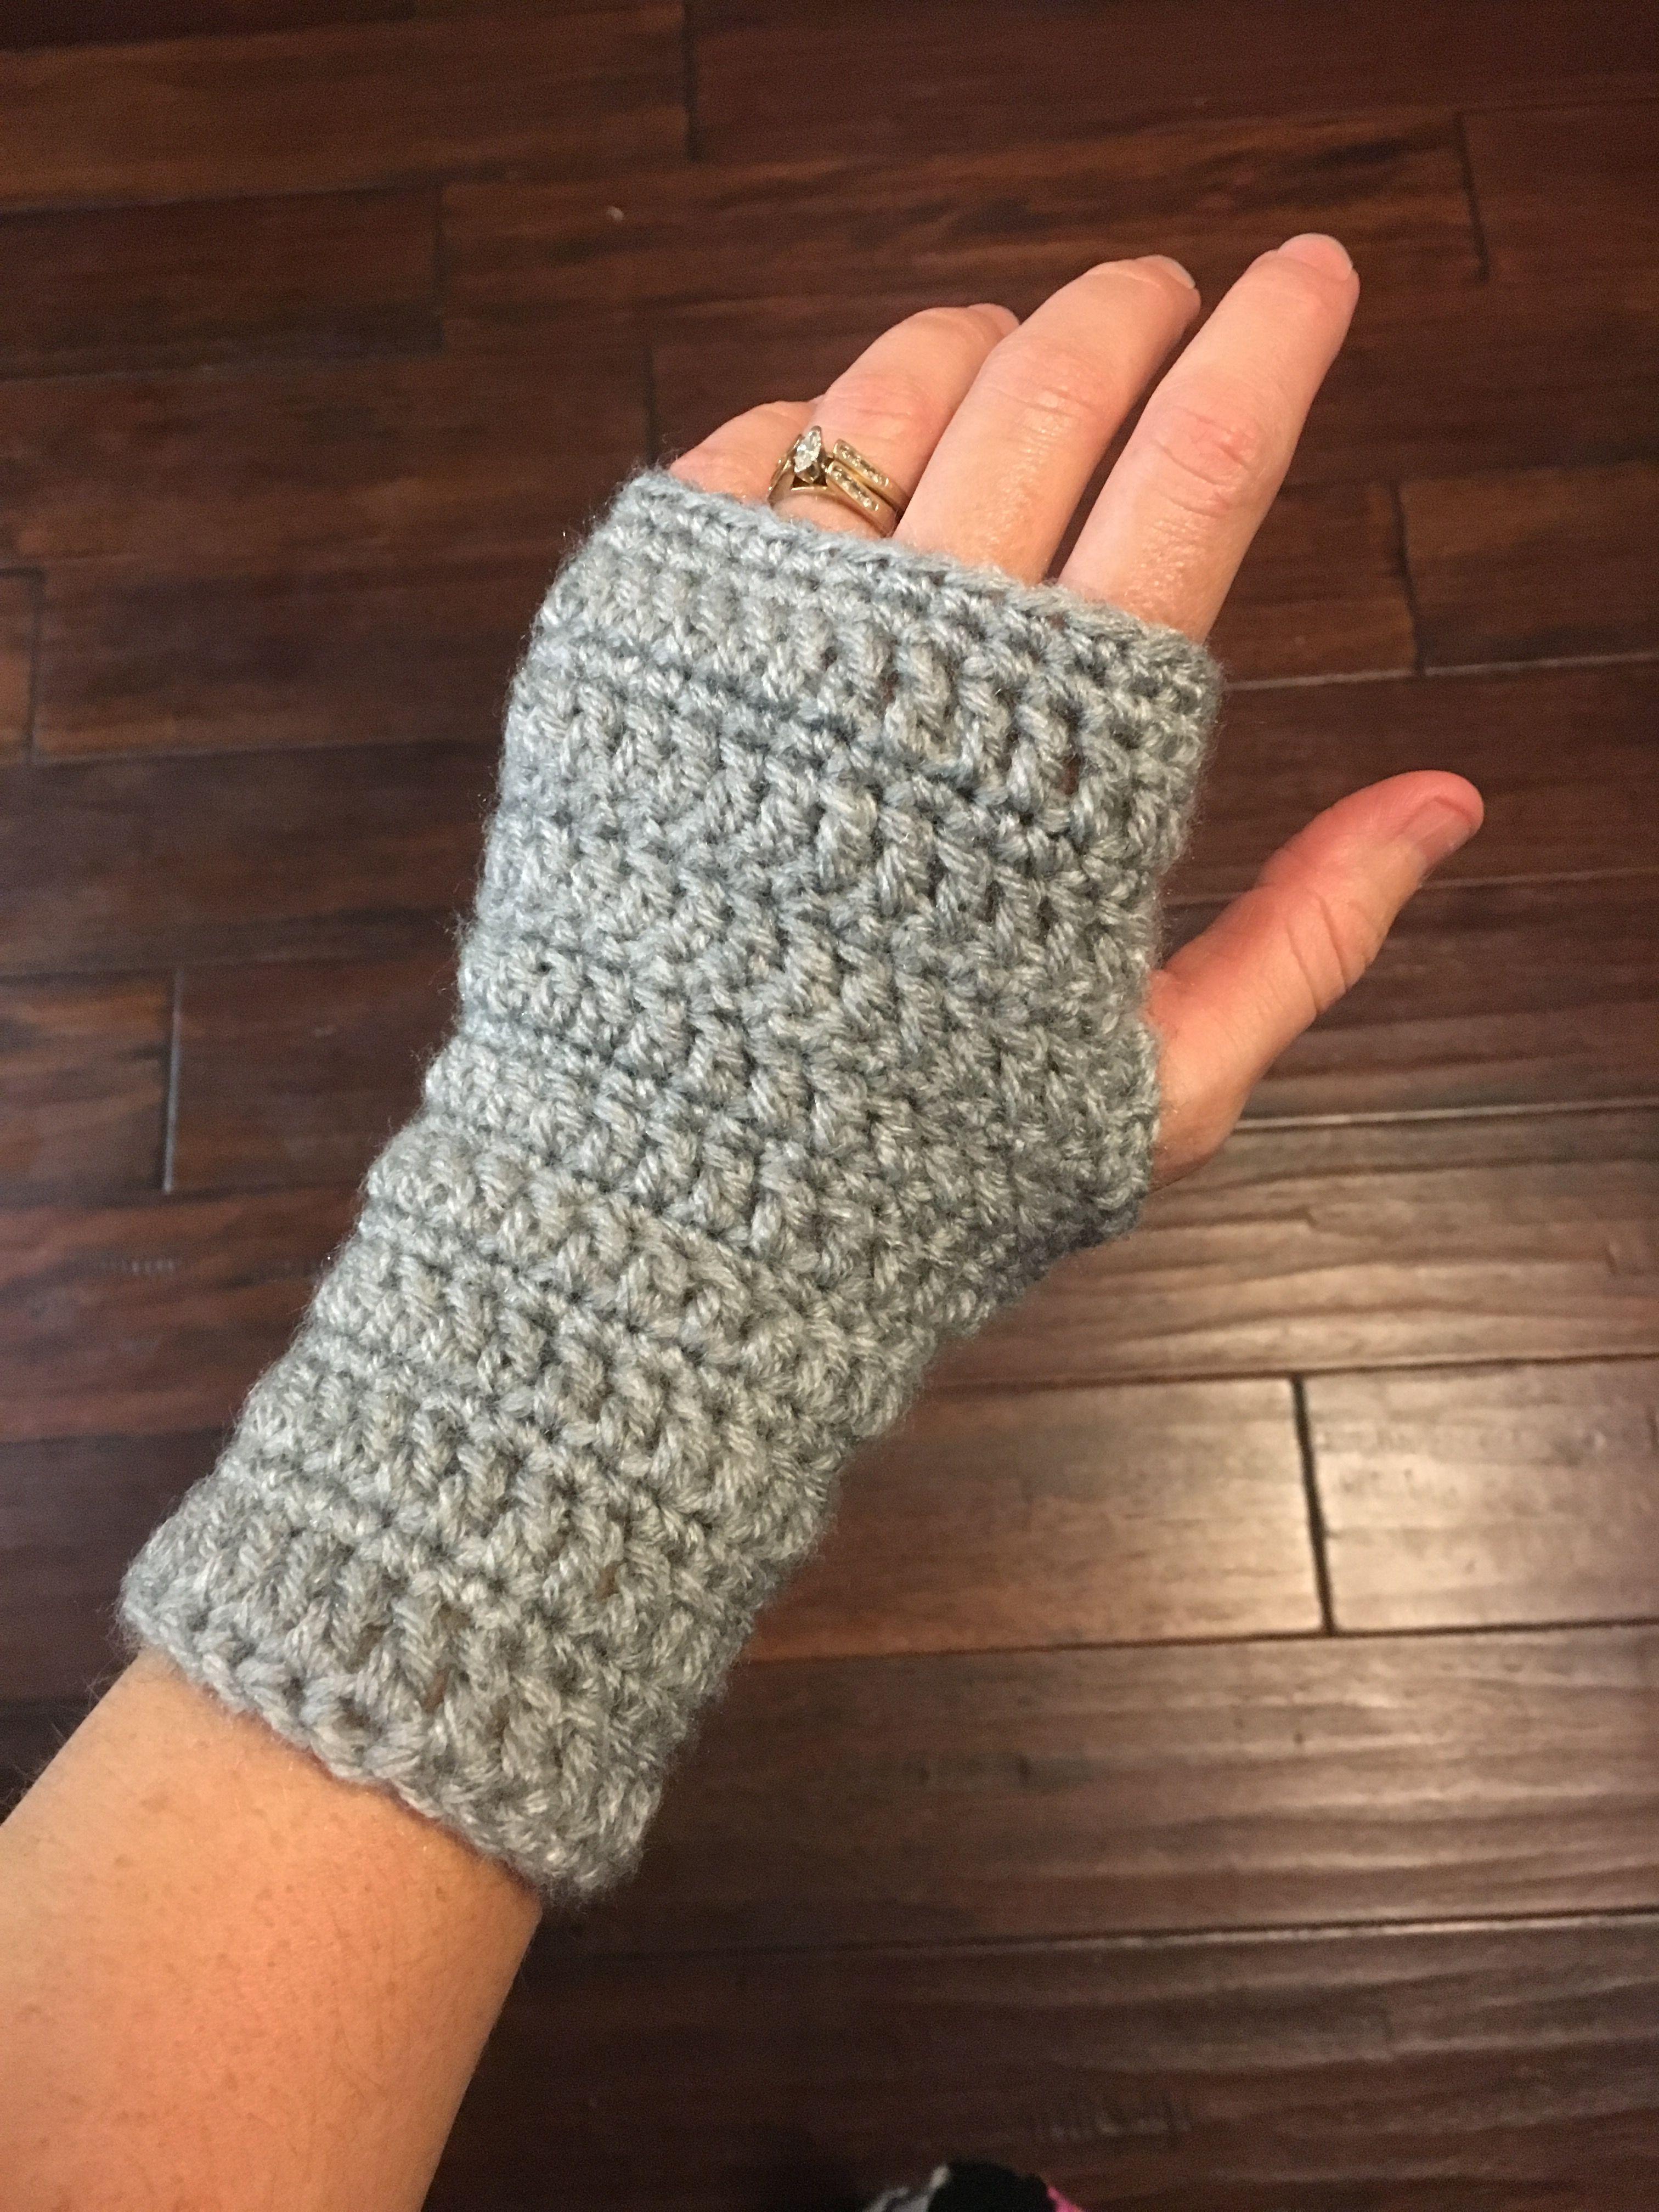 Simple Crochet Wrist Warmers   Wrist warmers, Fingerless gloves and ...